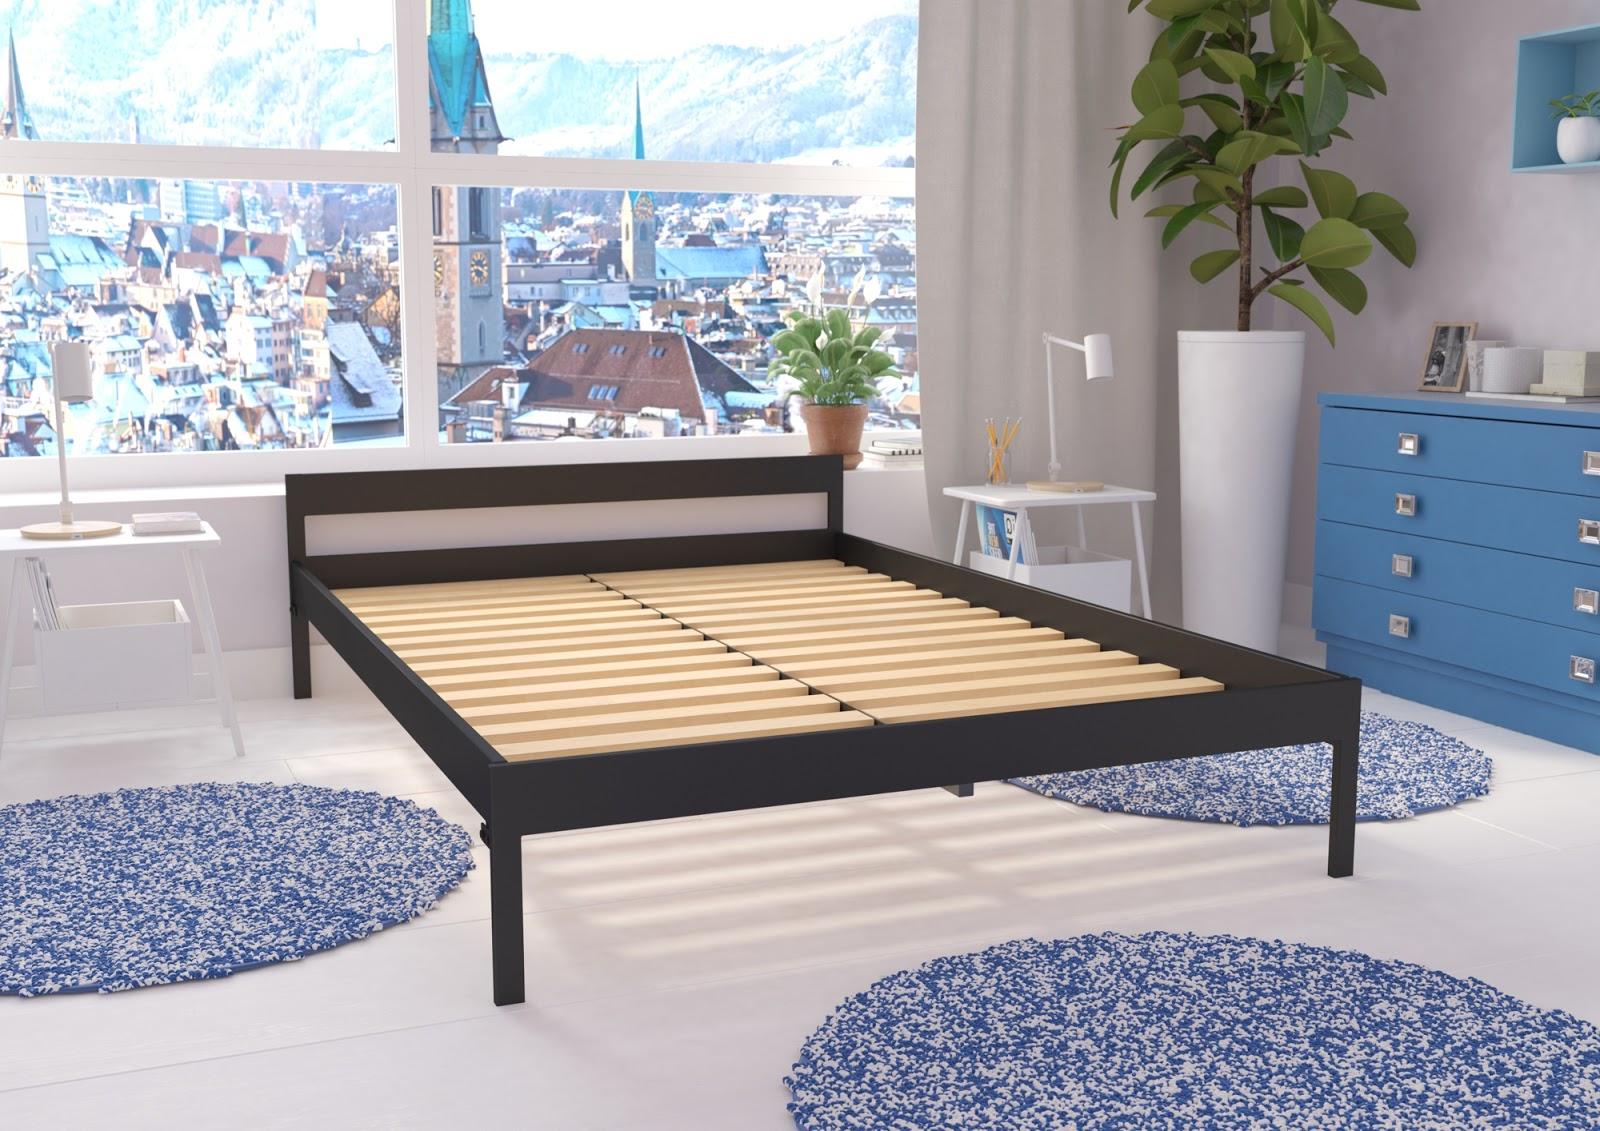 Łóżko metalowe wzór 1